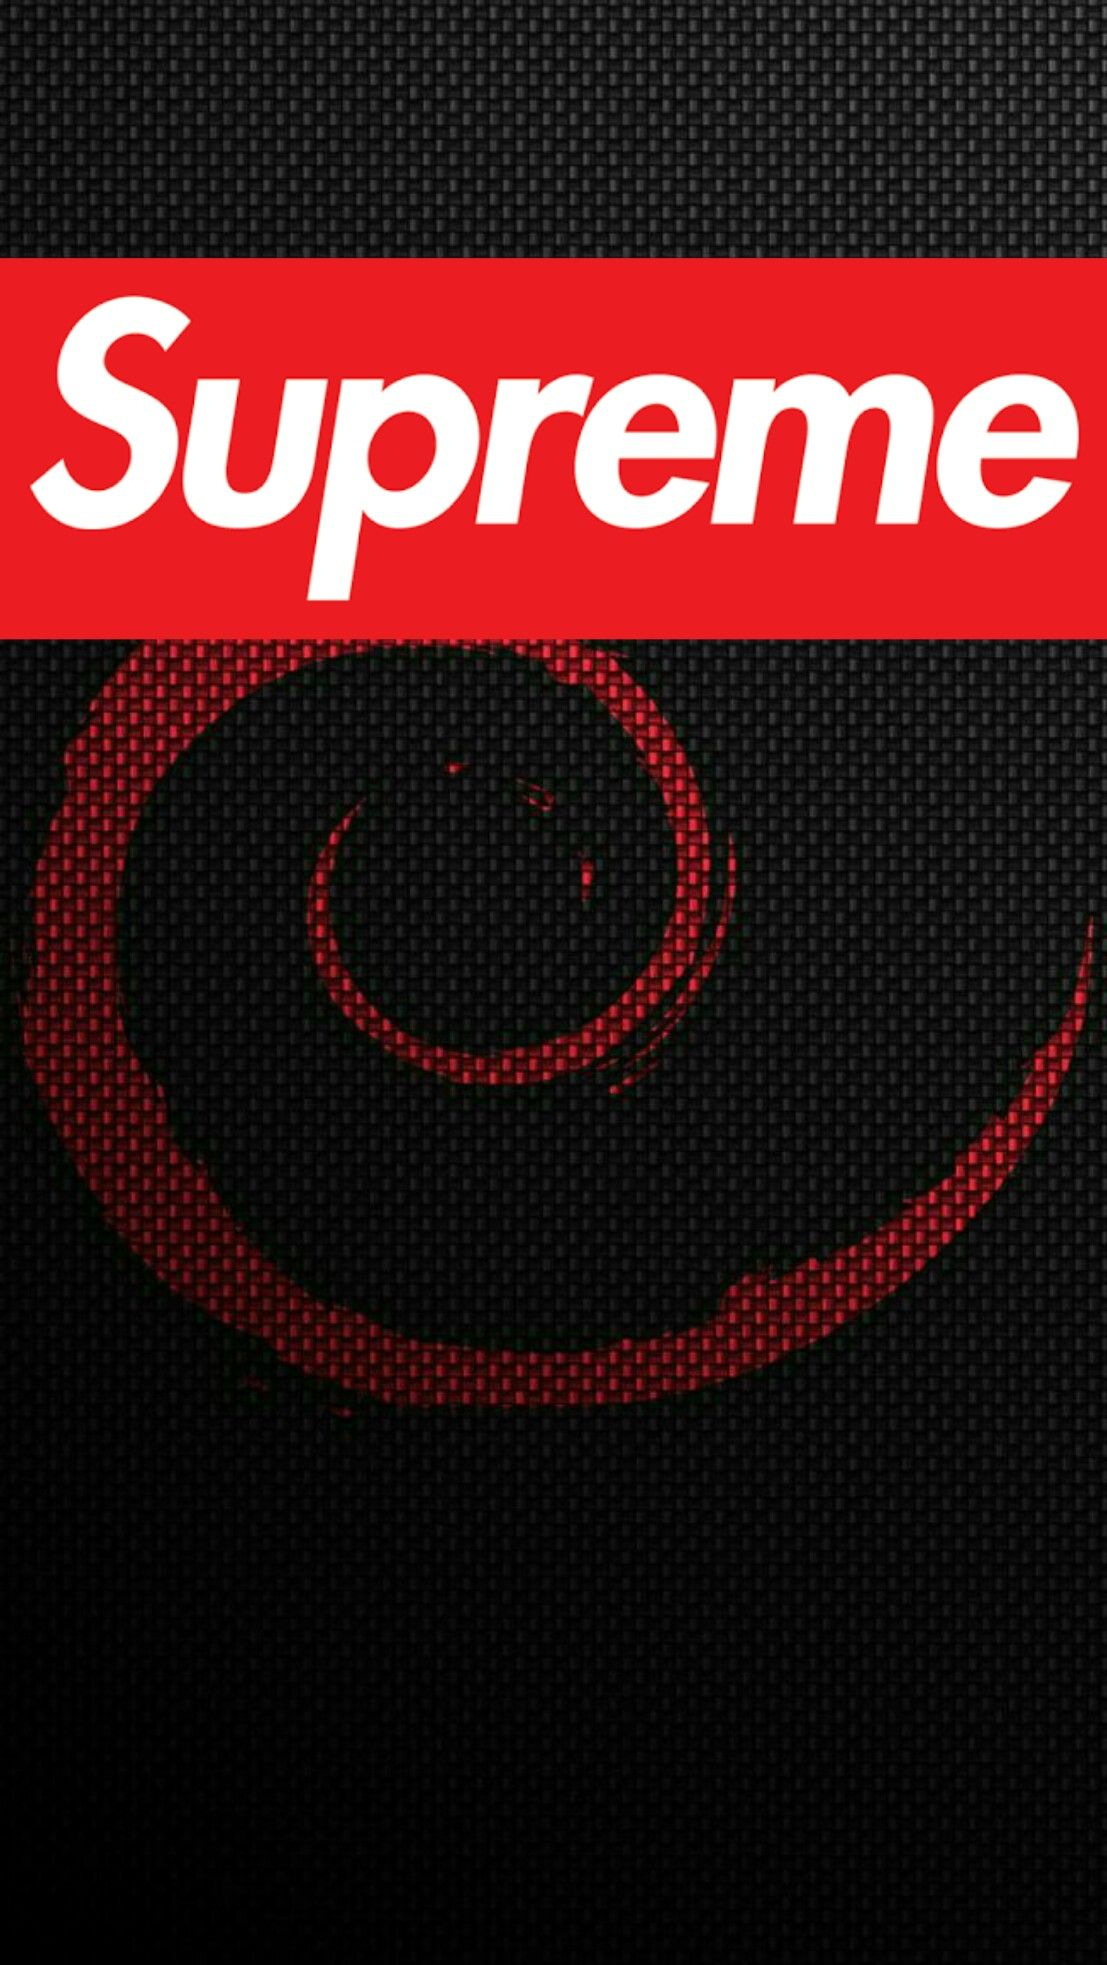 Samsung Edge S6 Supreme Black Wallpaper Android Iphone